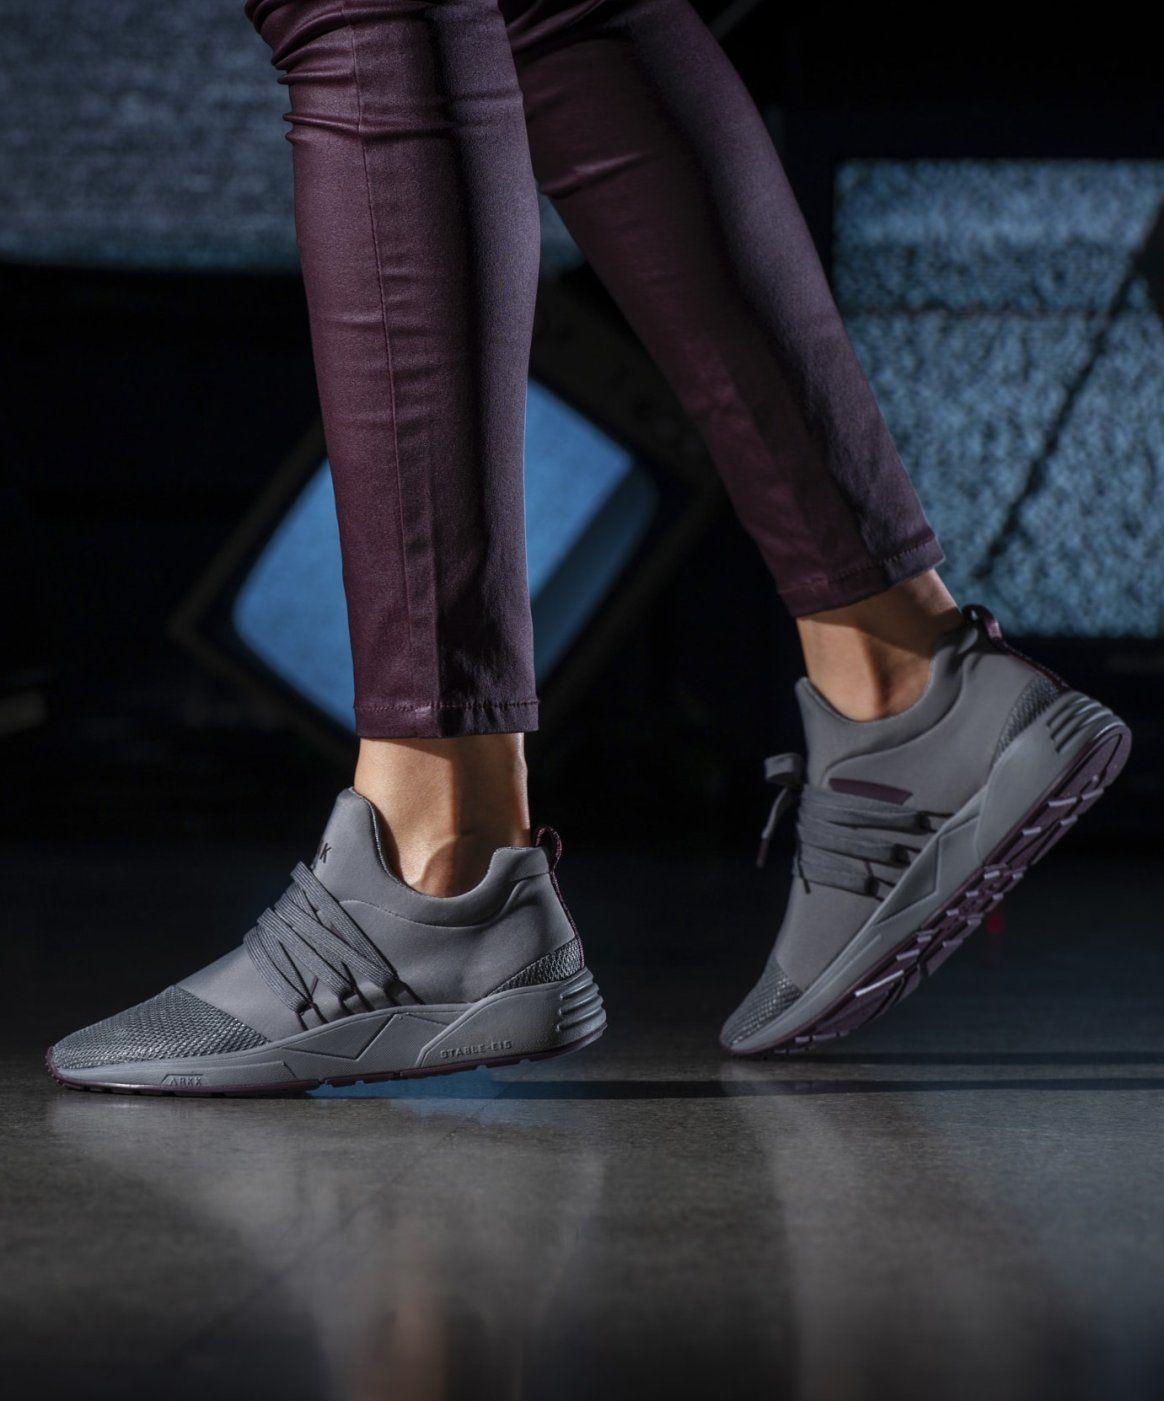 492fdc8ee559d Raven Mesh S-E15 Titanium Dark Bordeaux sneakers | Shoe timberland ...